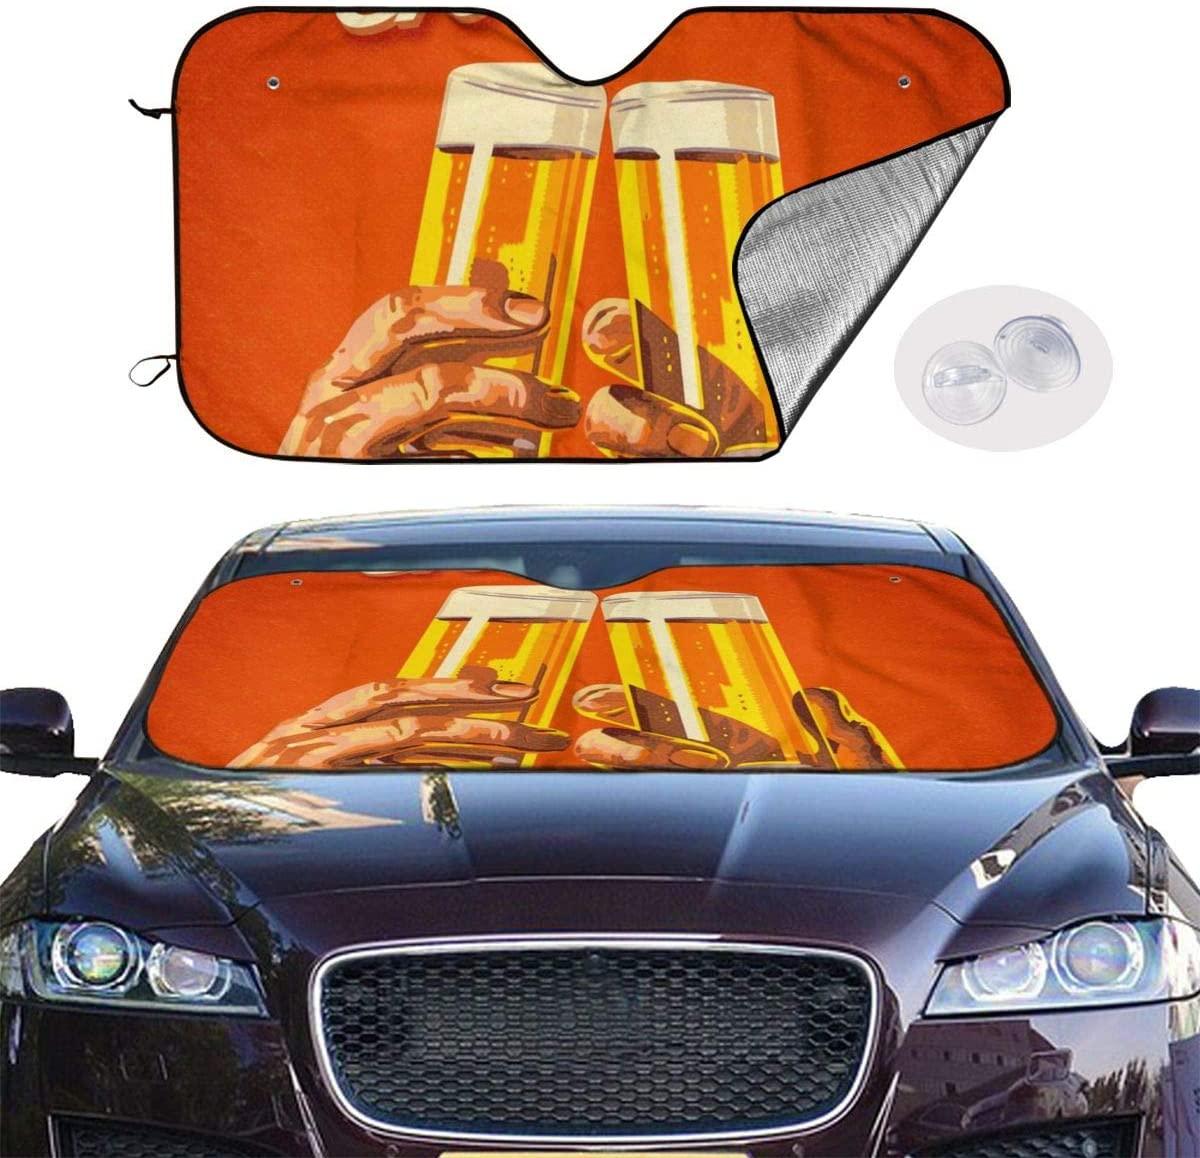 THONFIRE Car Windshield Sun Shade Cheers Beer Orange Blocks UV Rays Keeps Your Vehicle Cool Visor Protector Automobile Front Window Heatshield